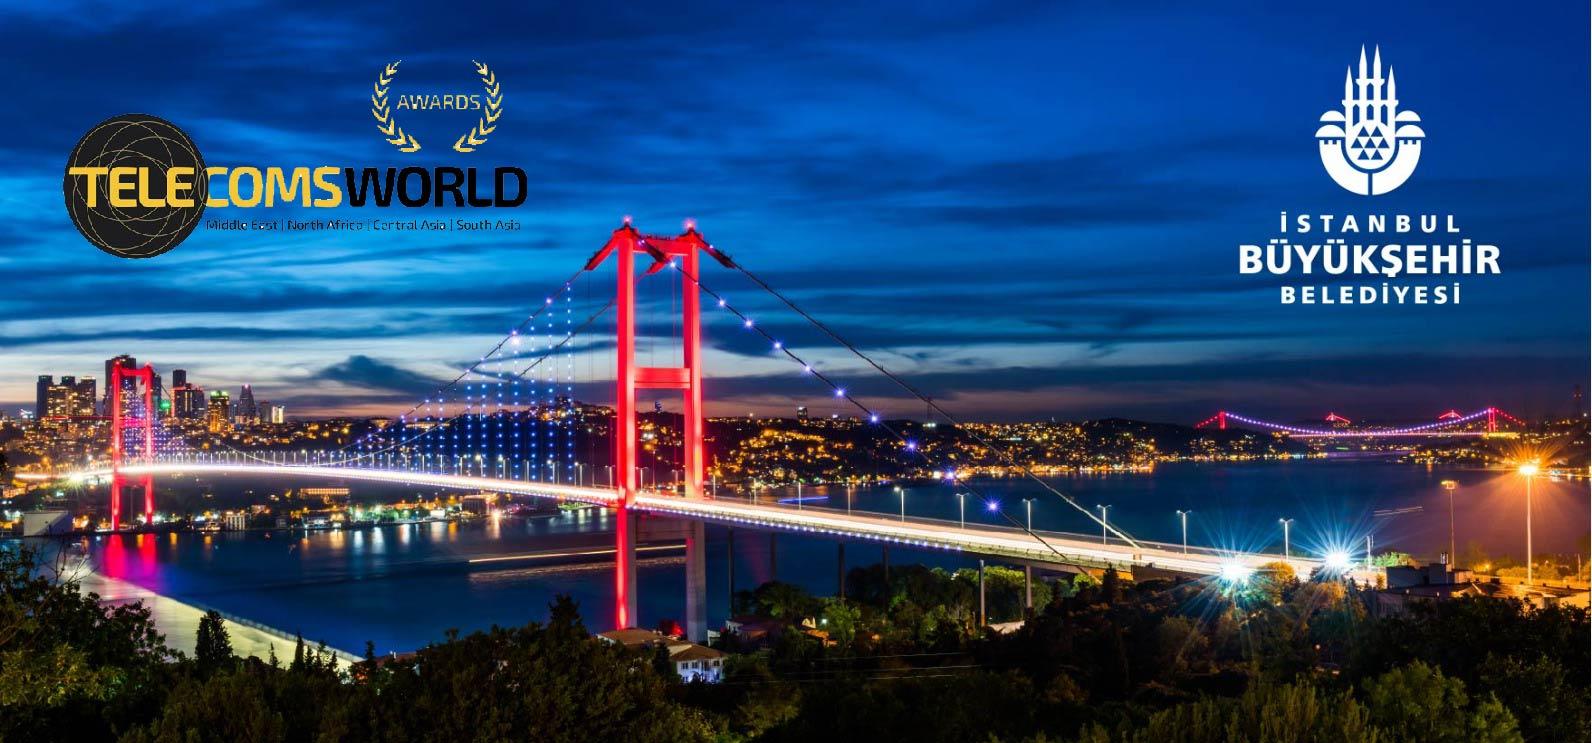 IMM WiFi WINS A TELECOMS WORLD AWARD